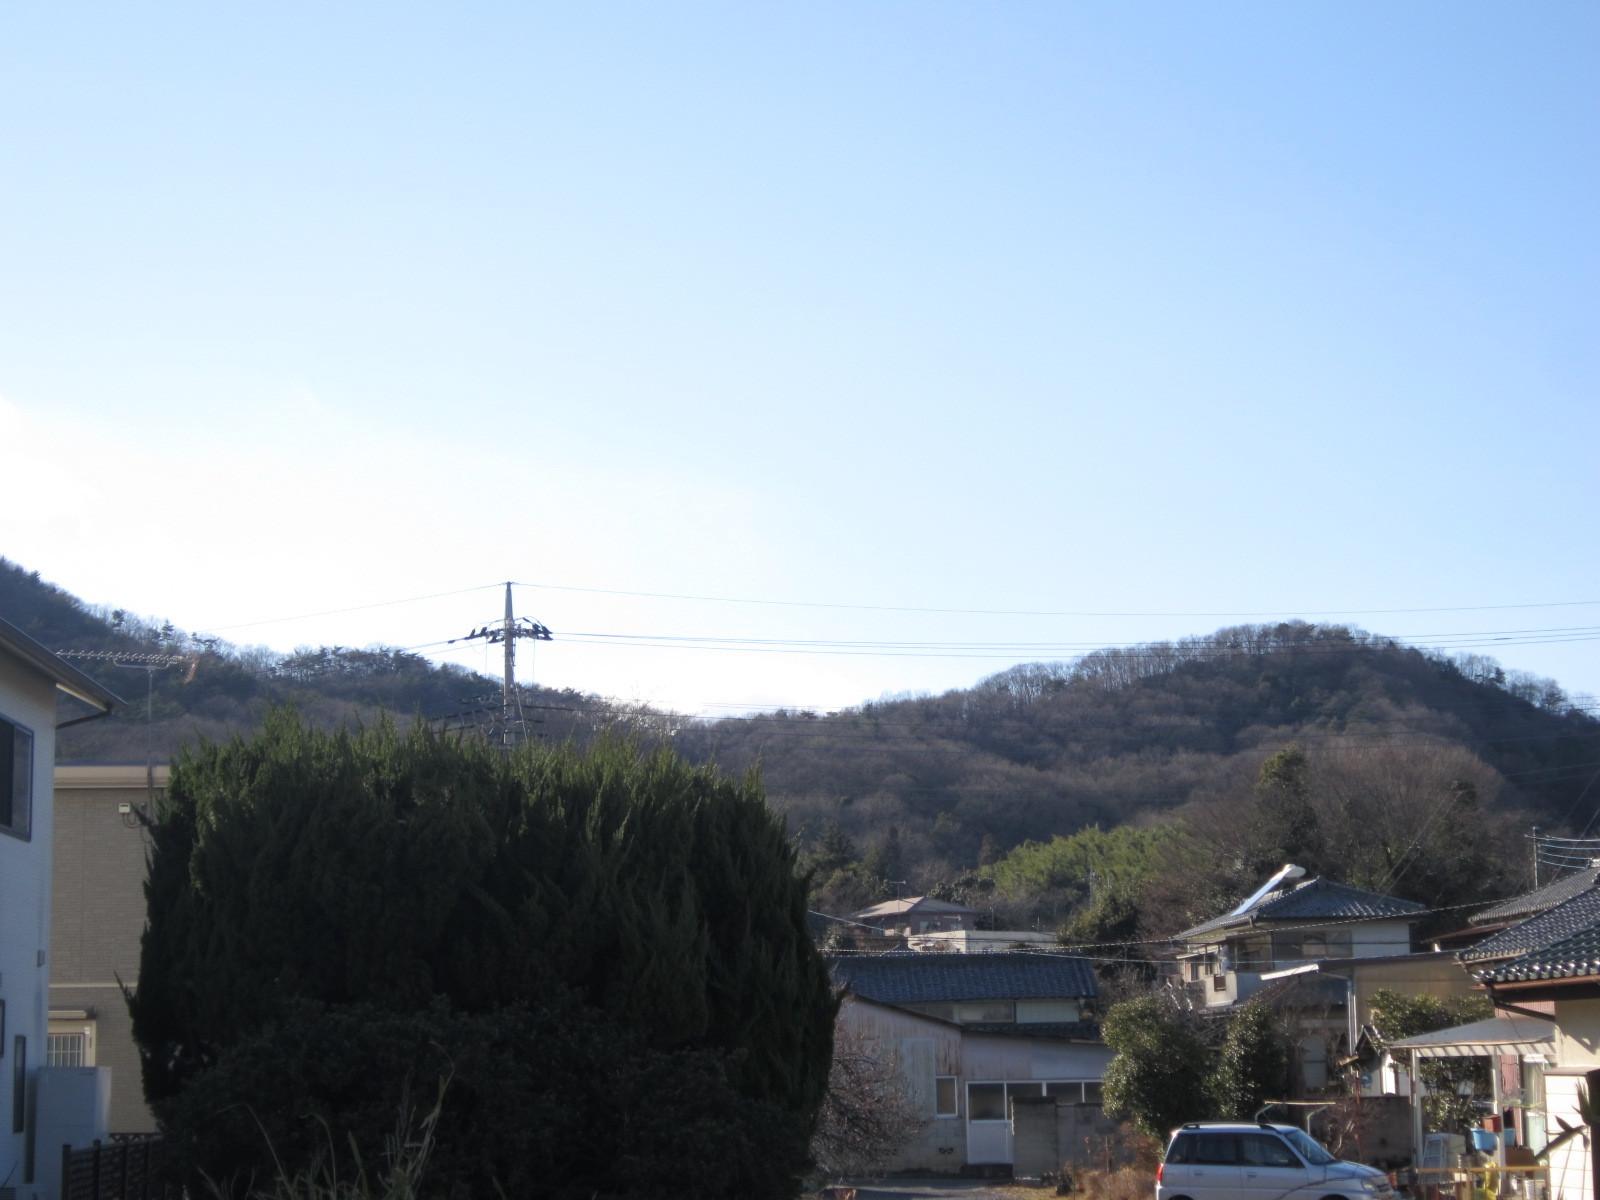 Garden Flow 事務所からの景観です!(太田の田舎ですが、とても落ち着く私の居場所です。)1週間前の投稿🙇_e0361918_15573382.jpg